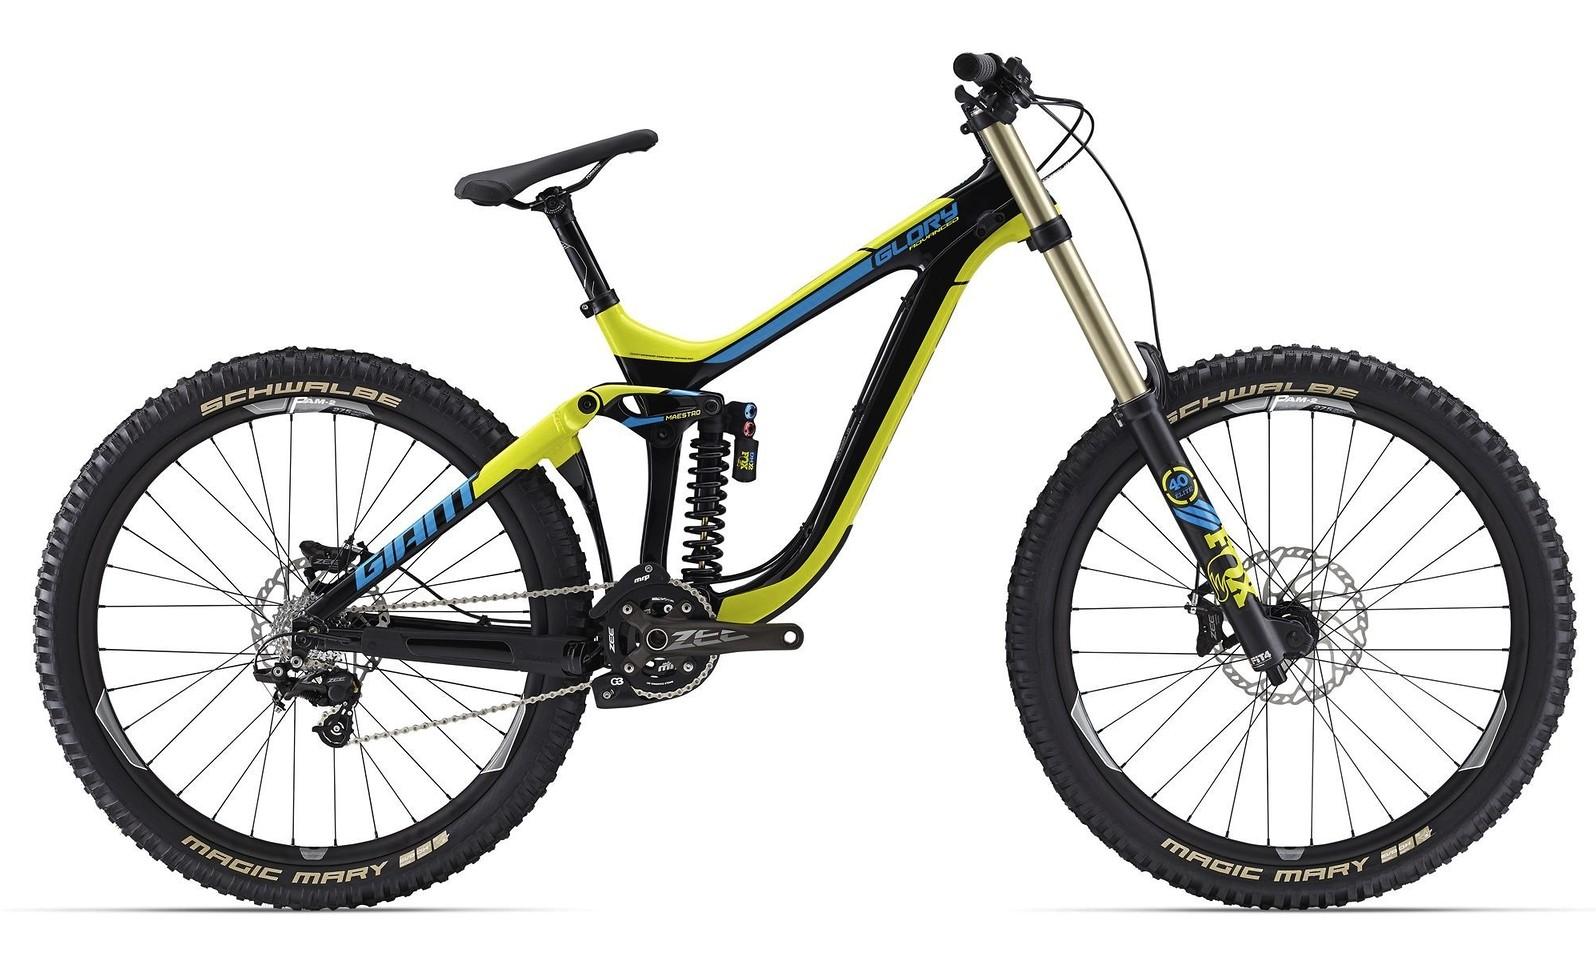 2016 Giant Glory Advanced 27.5 1 Bike 2016 Giant Glory Advanced 27.5 1